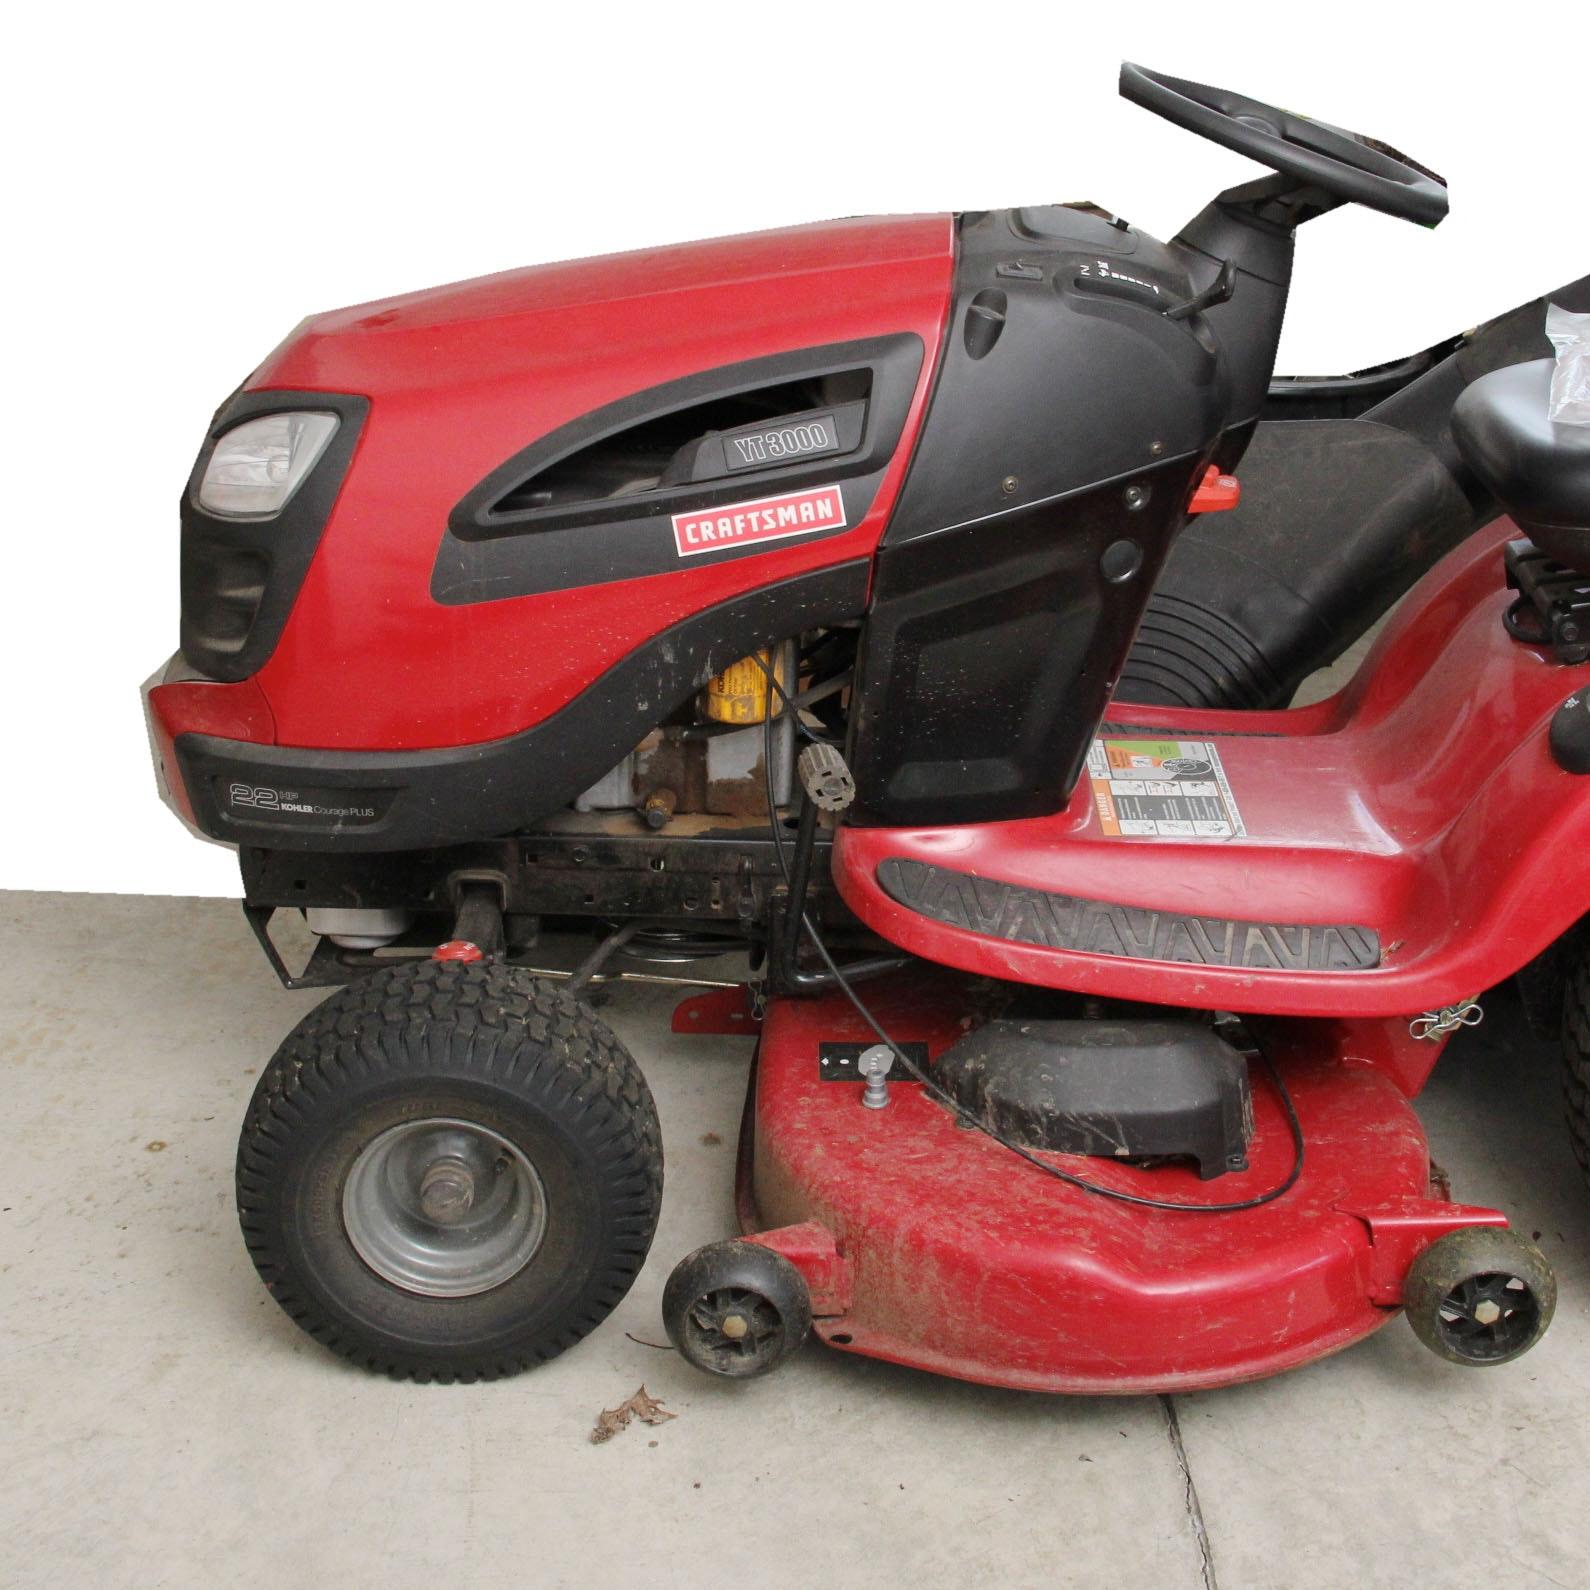 Craftsman Ty3000 Riding Lawn Mower Ebth